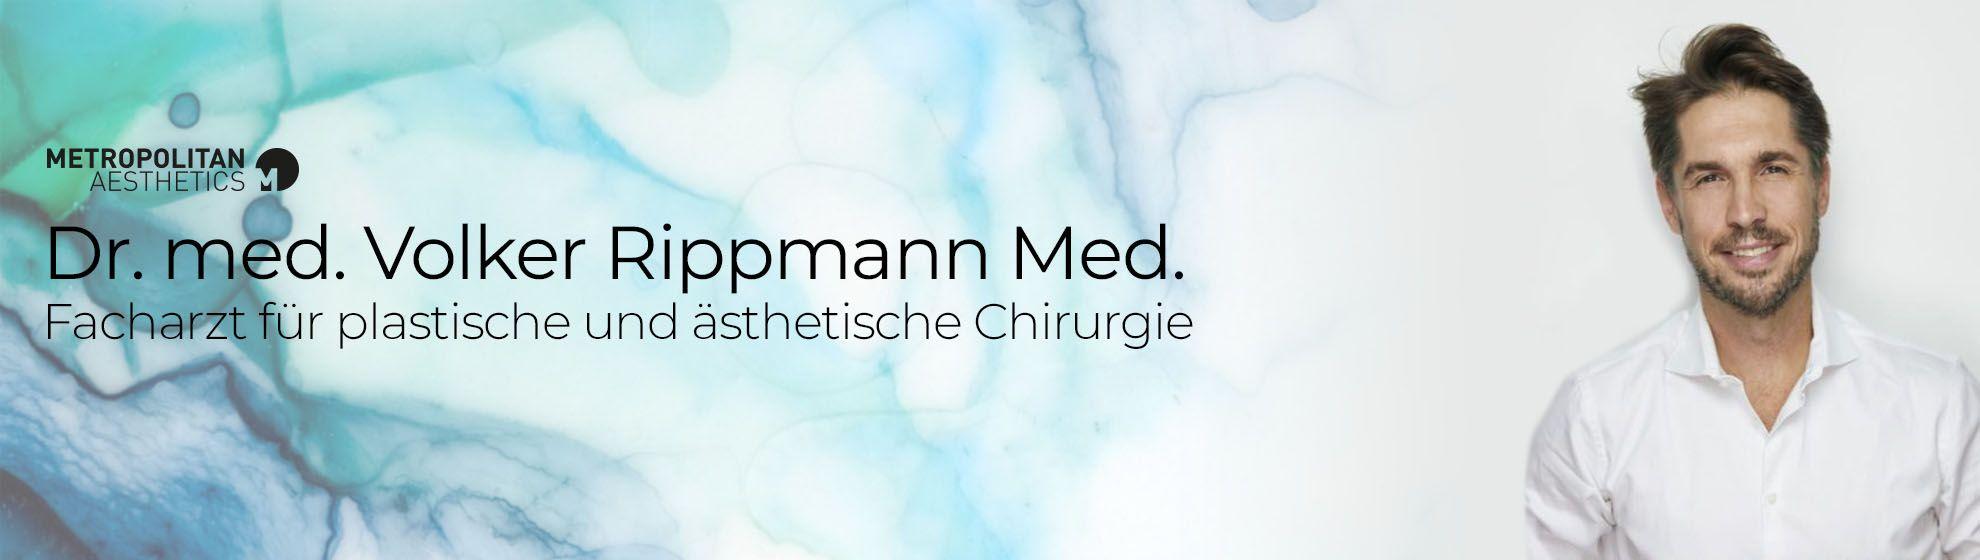 Dr. med. Volker Rippmann Med.